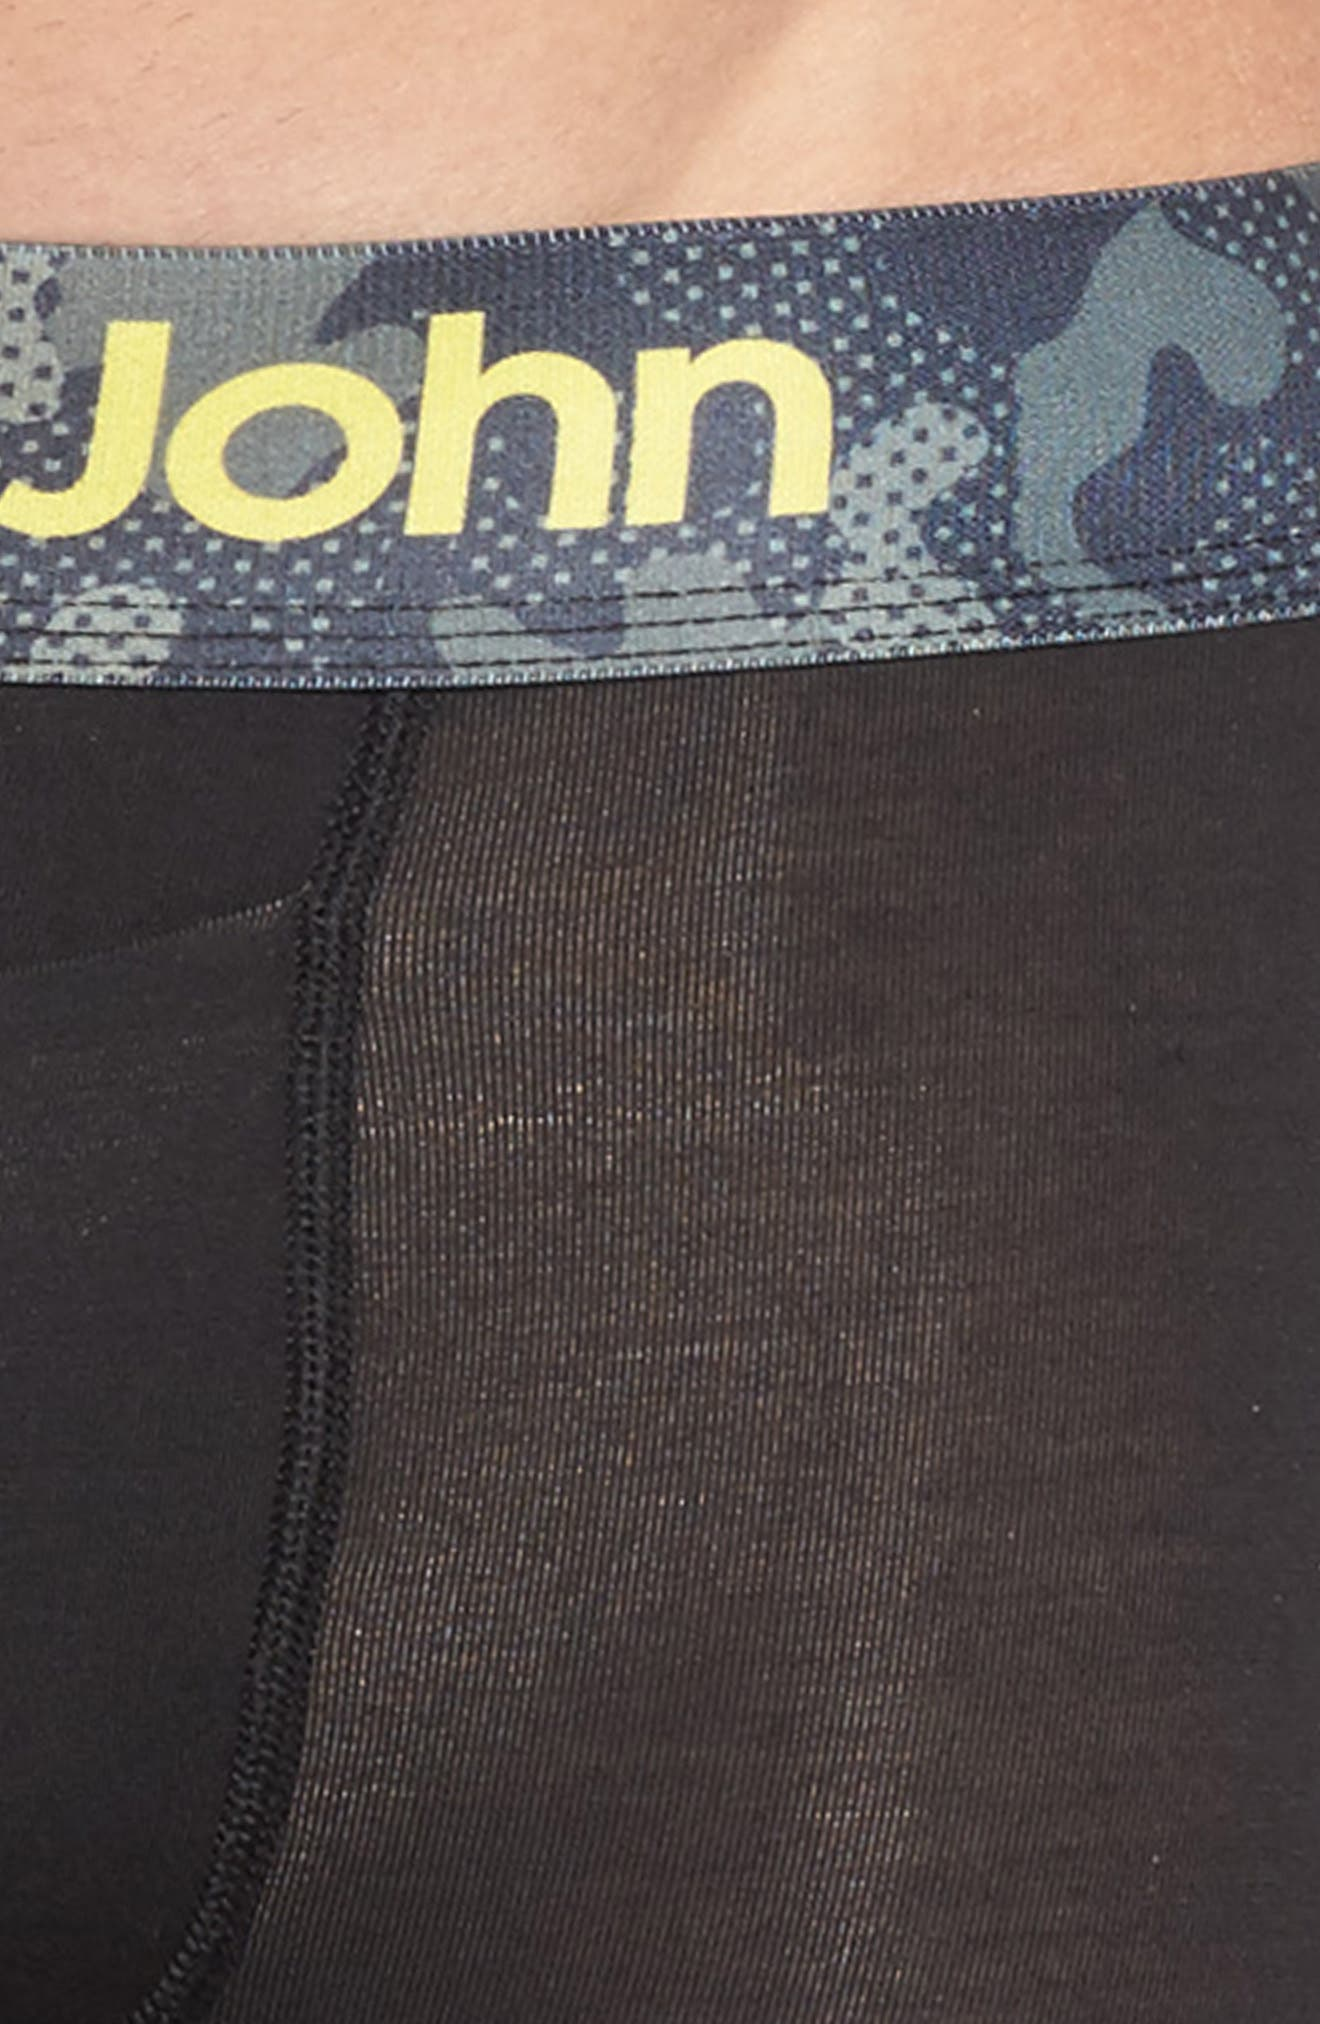 Kevin Hart Second Skin Boxer Briefs,                             Alternate thumbnail 4, color,                             Black